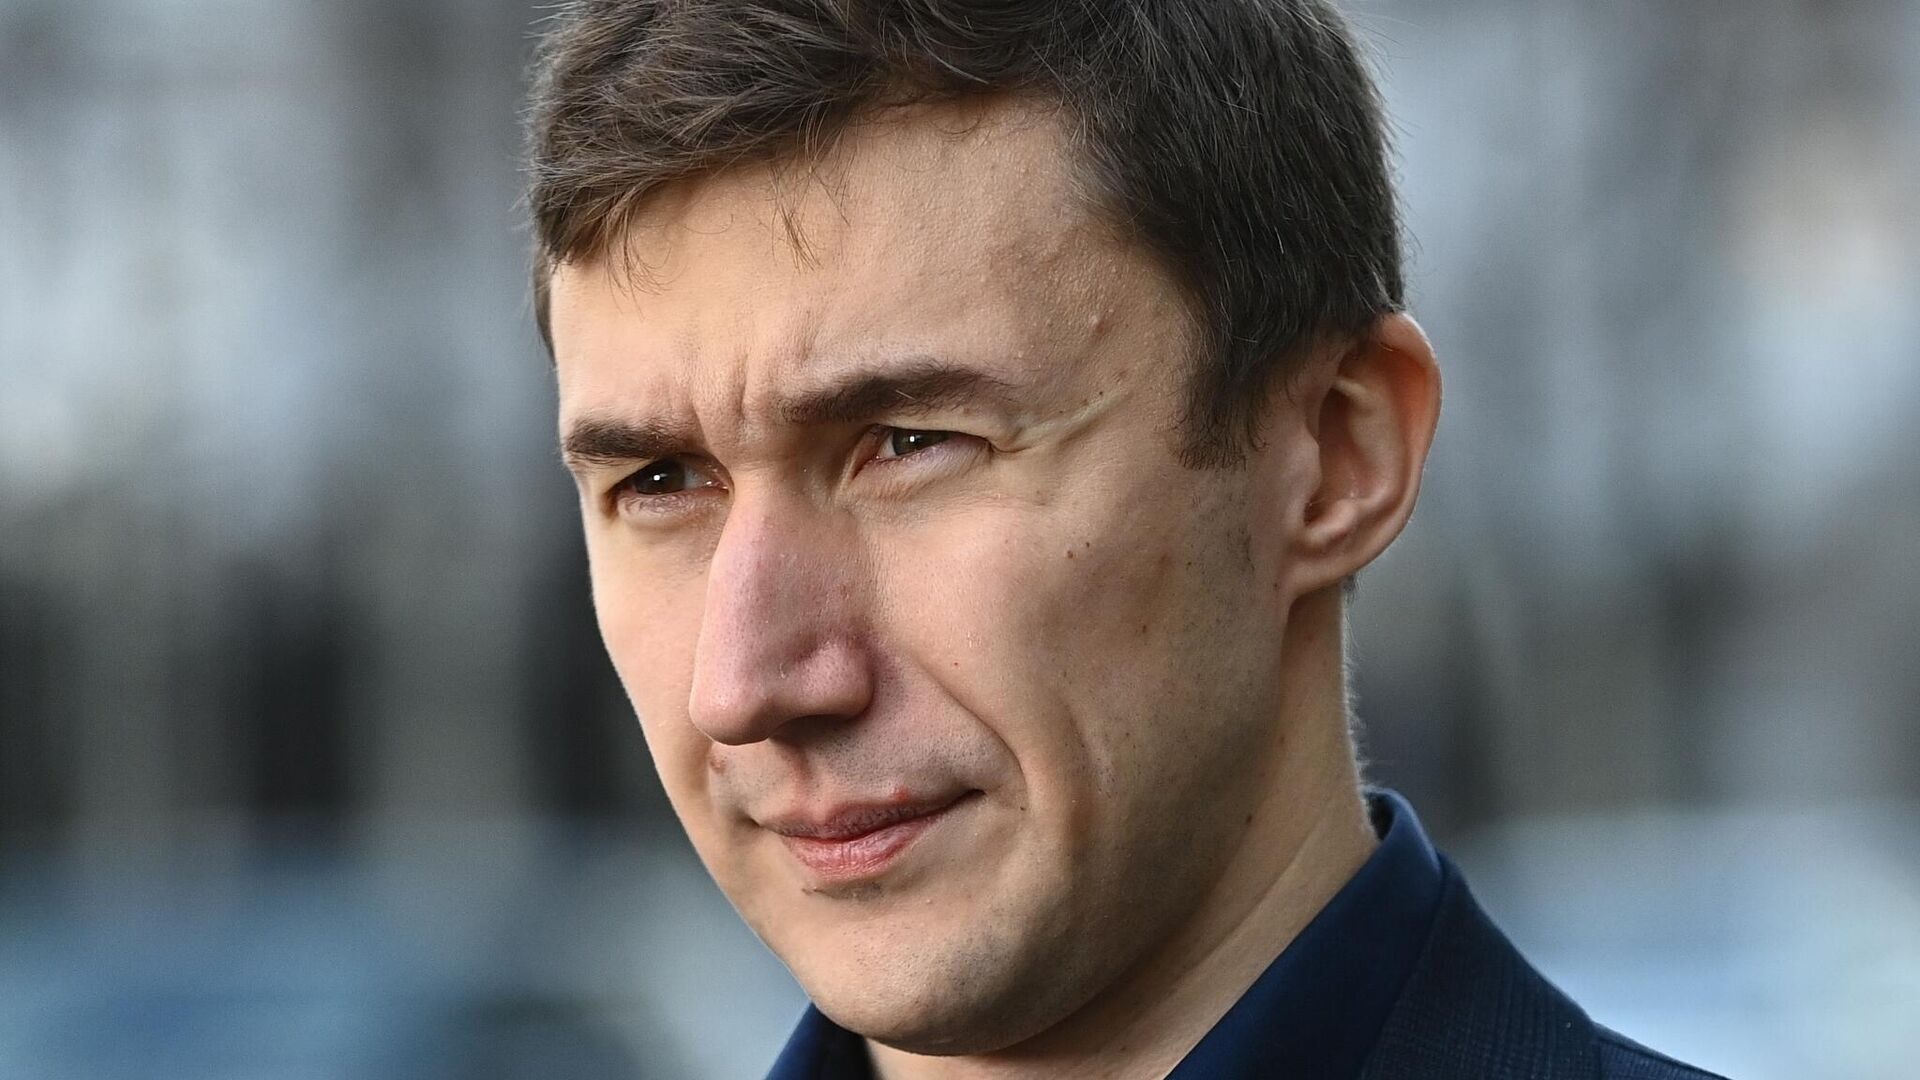 Турнир претендентов по шахматам возобновится с 19 апреля - РИА Новости, 1920, 02.08.2021